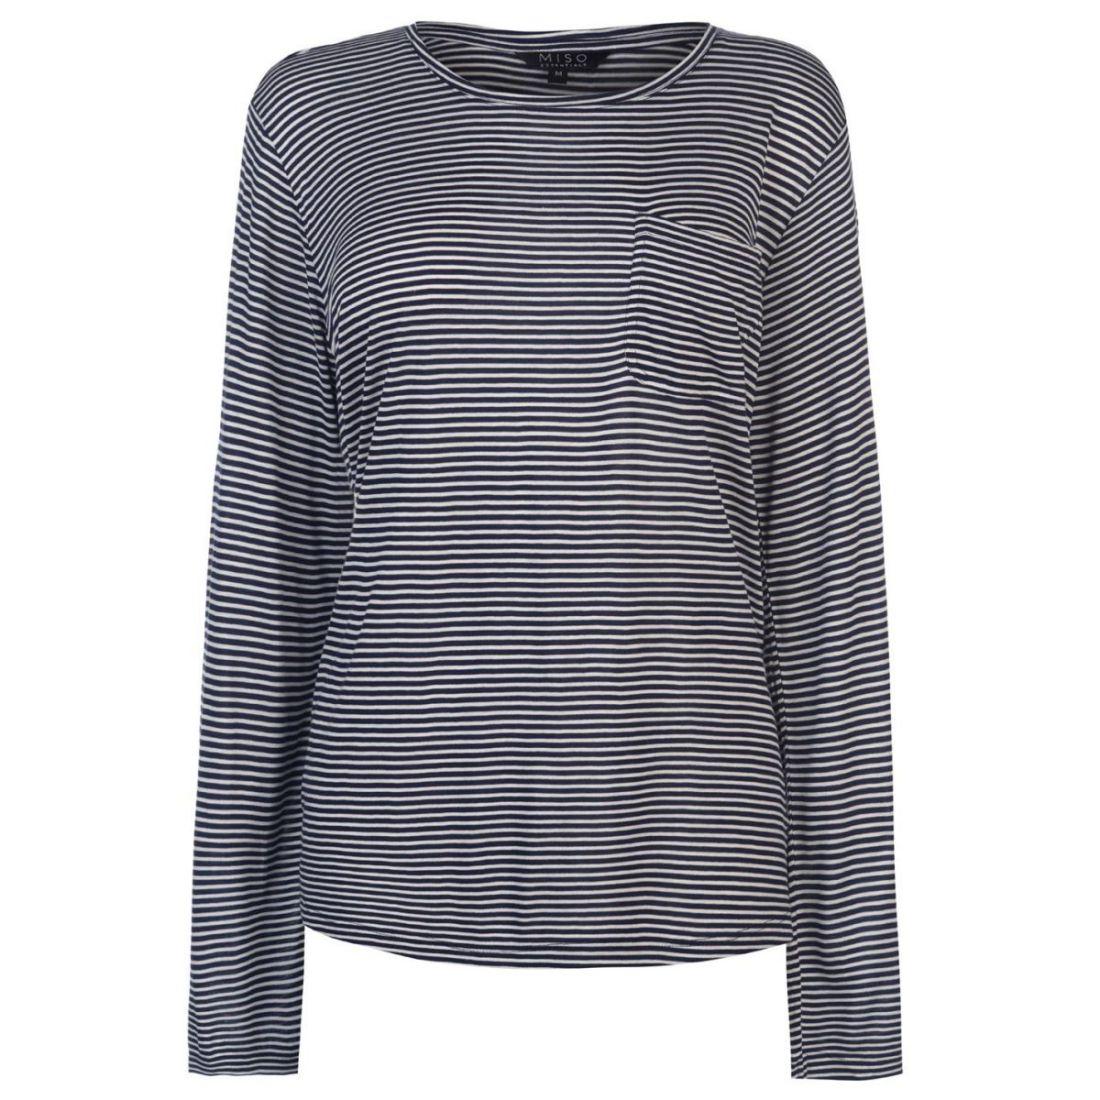 Miso Striped Pocket Top Ladies Shirt Full Length Sleeve Round Neck Lightweight